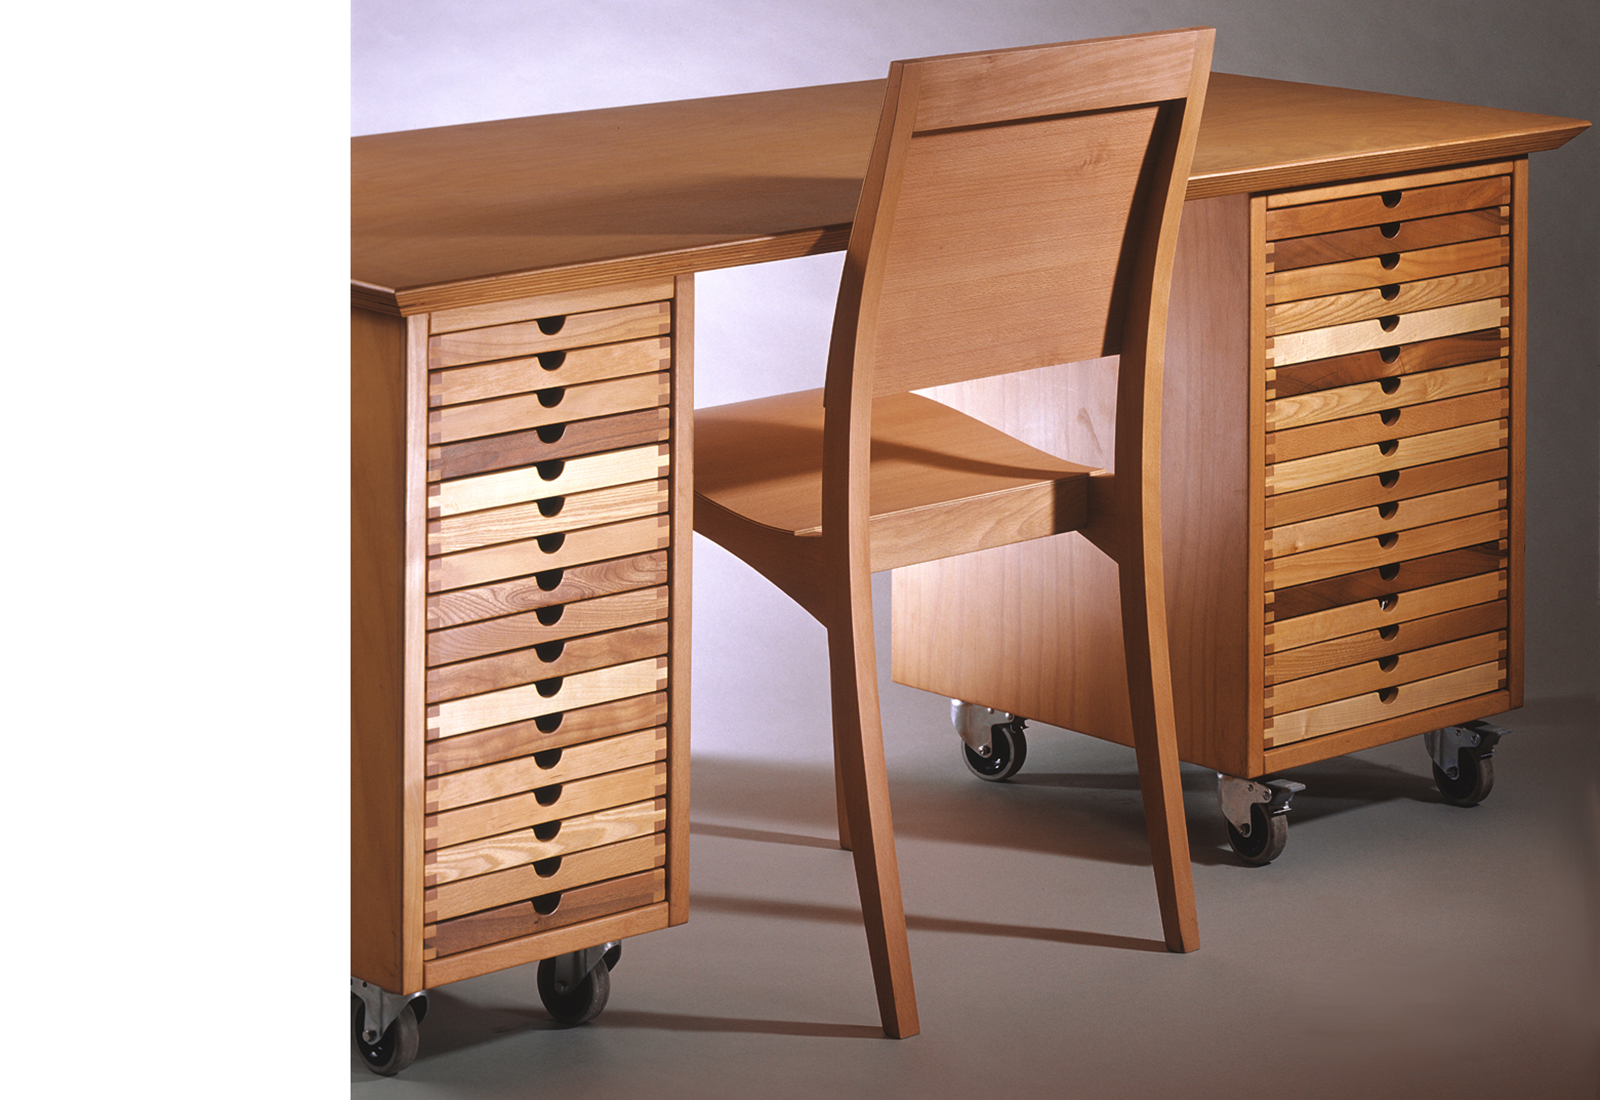 SIXtematic desk